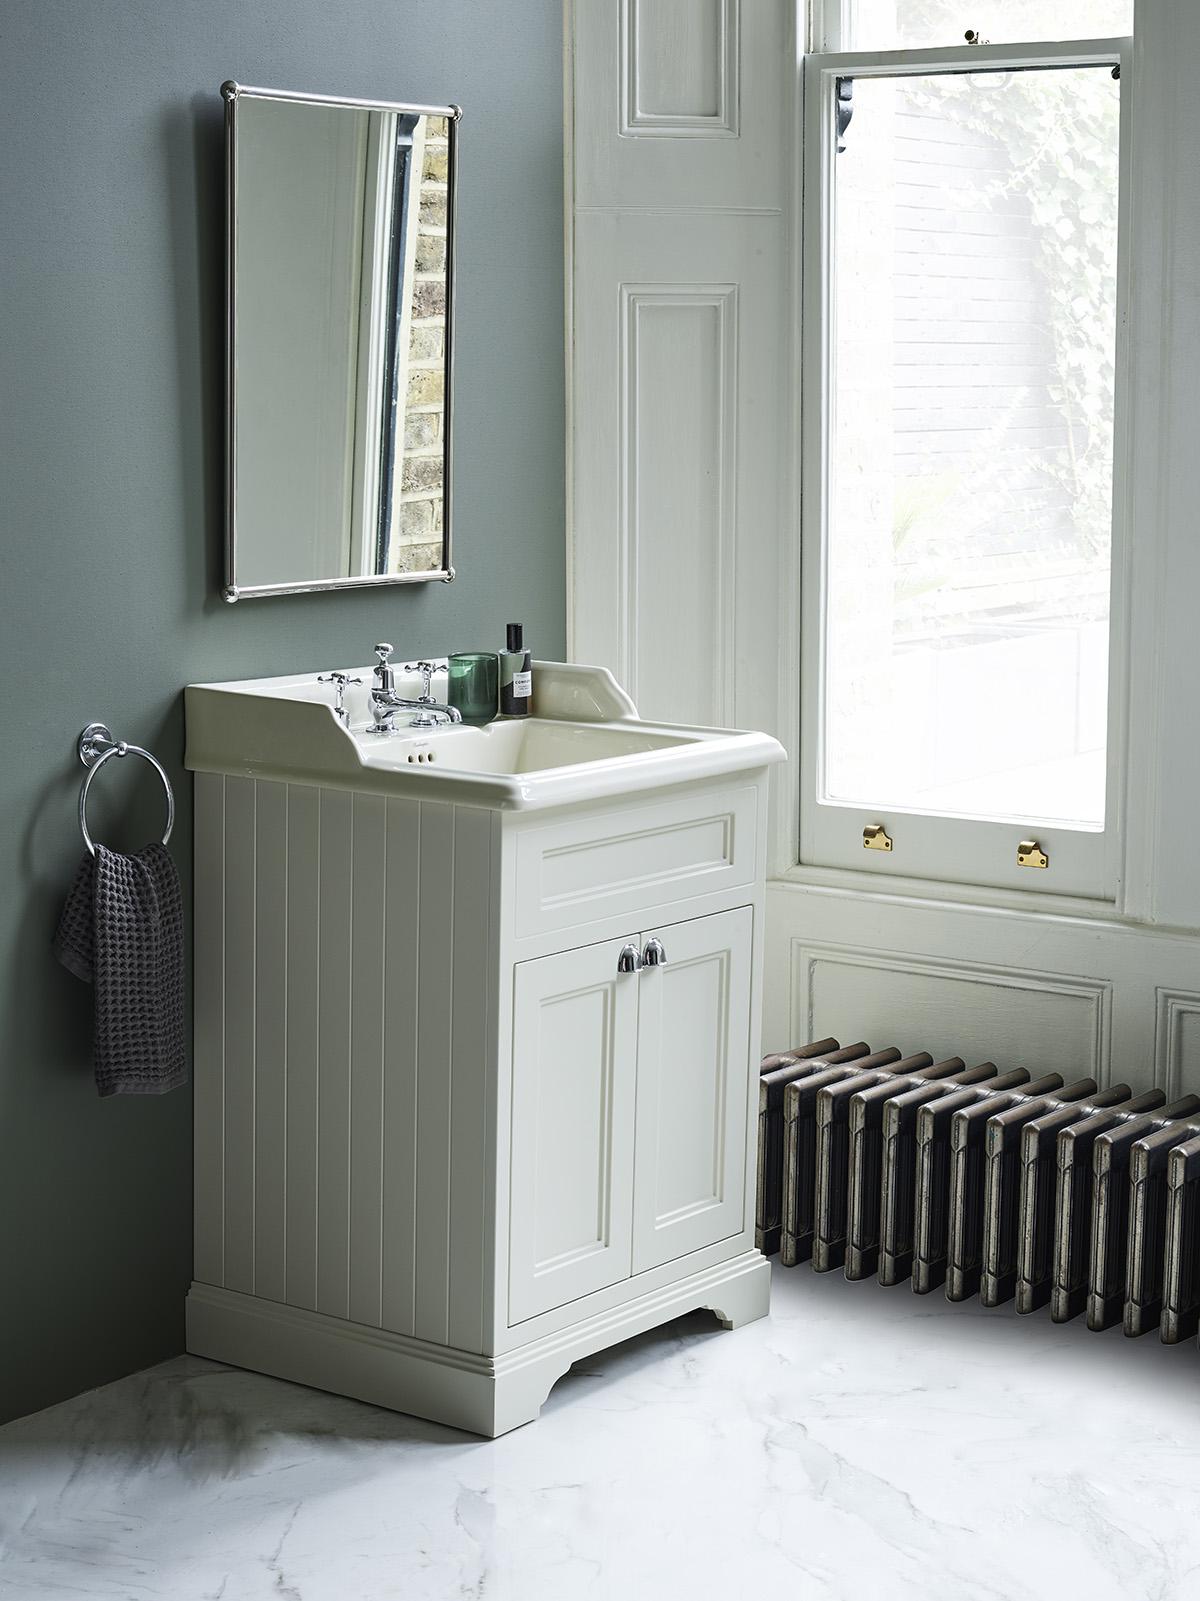 Medici ivory basin and vanity unit - Burlington Bathrooms 1200px.jpg